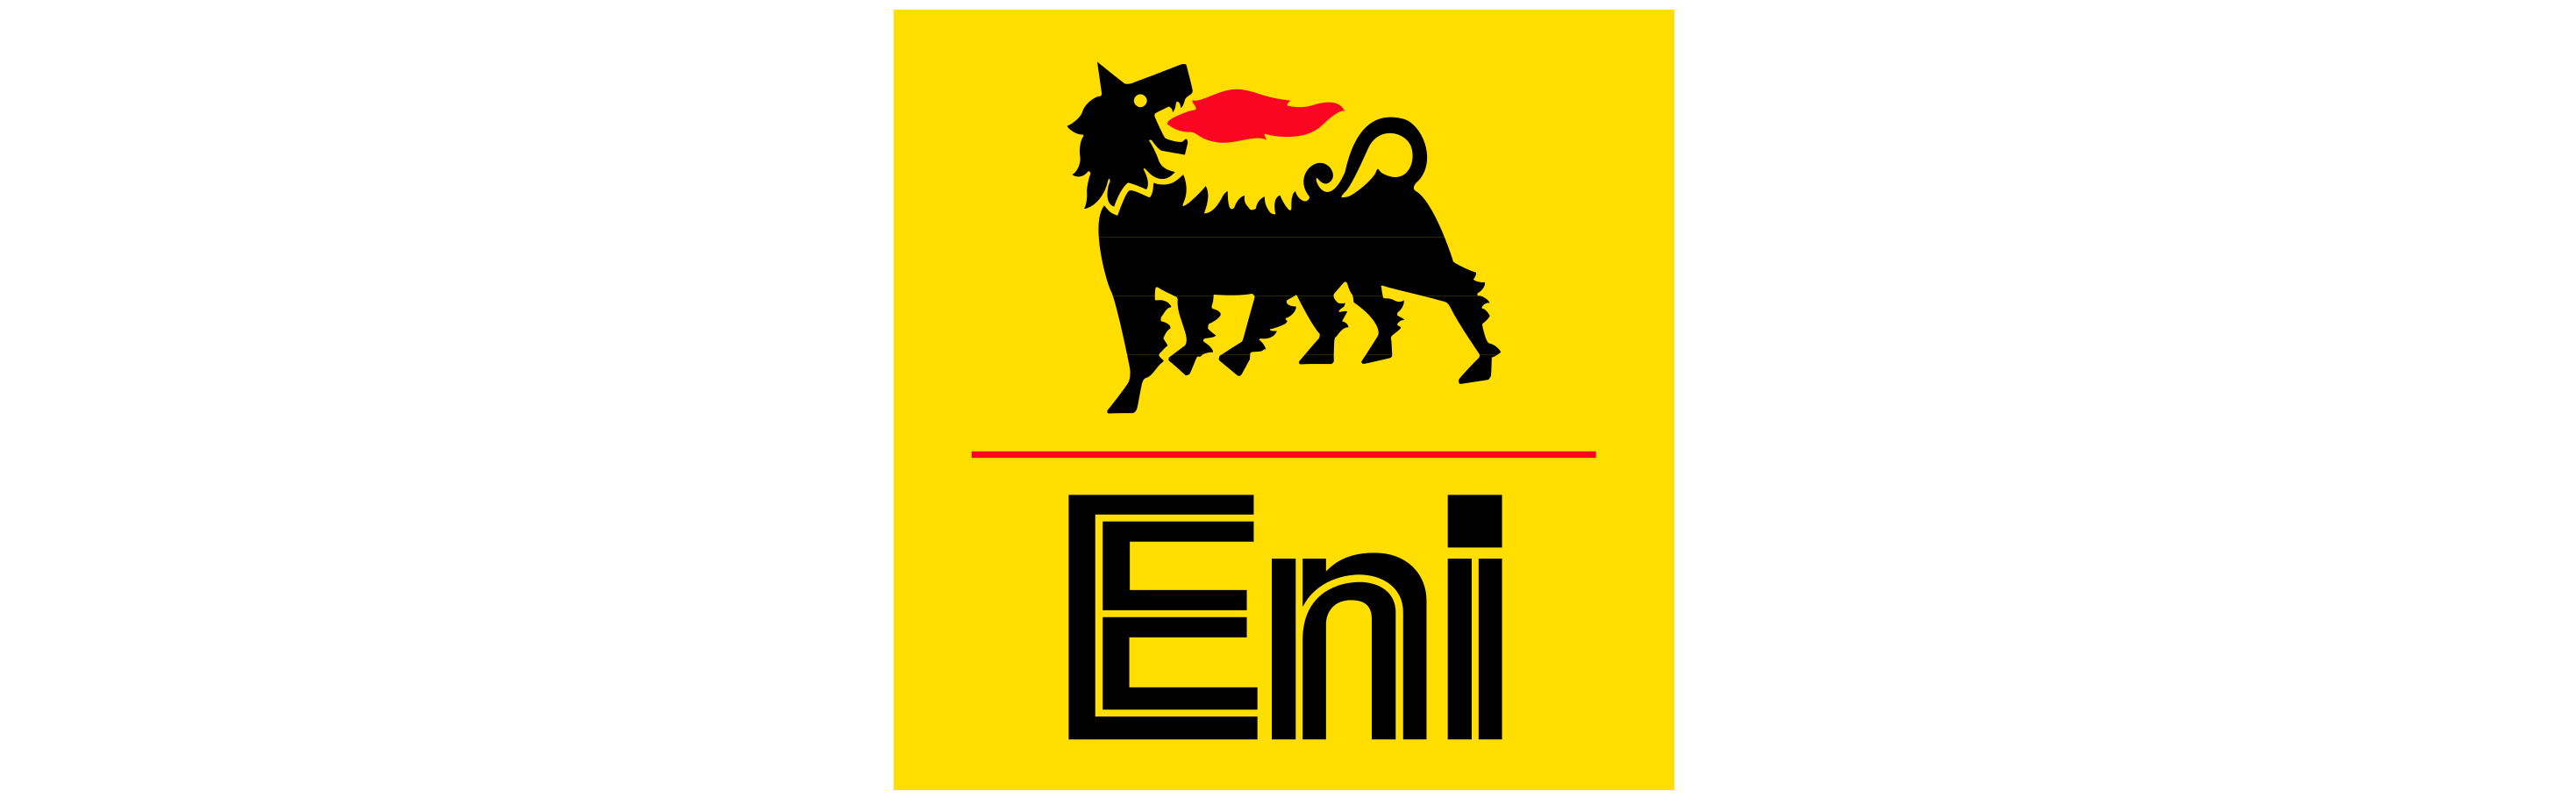 ENI company logo